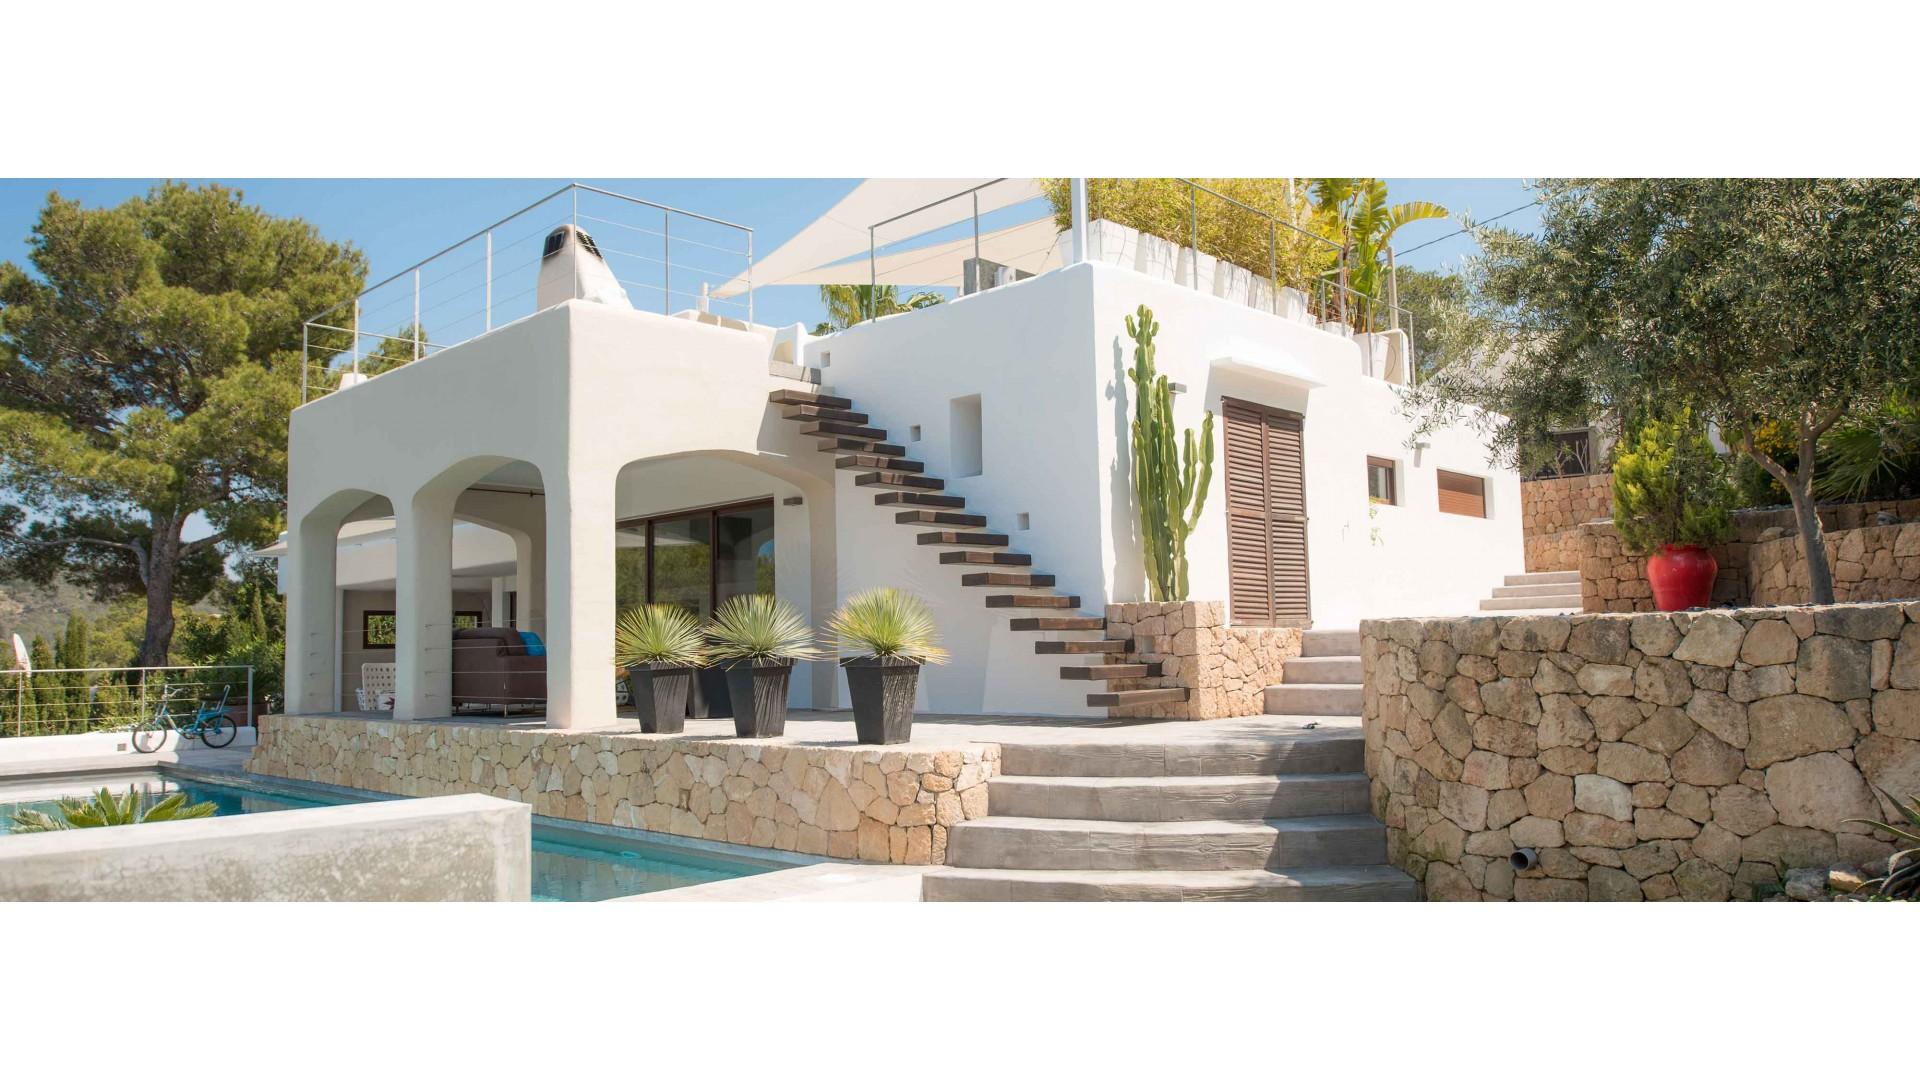 Can Serenidad Luxury villa in Ibiza Balearic Islands Smith